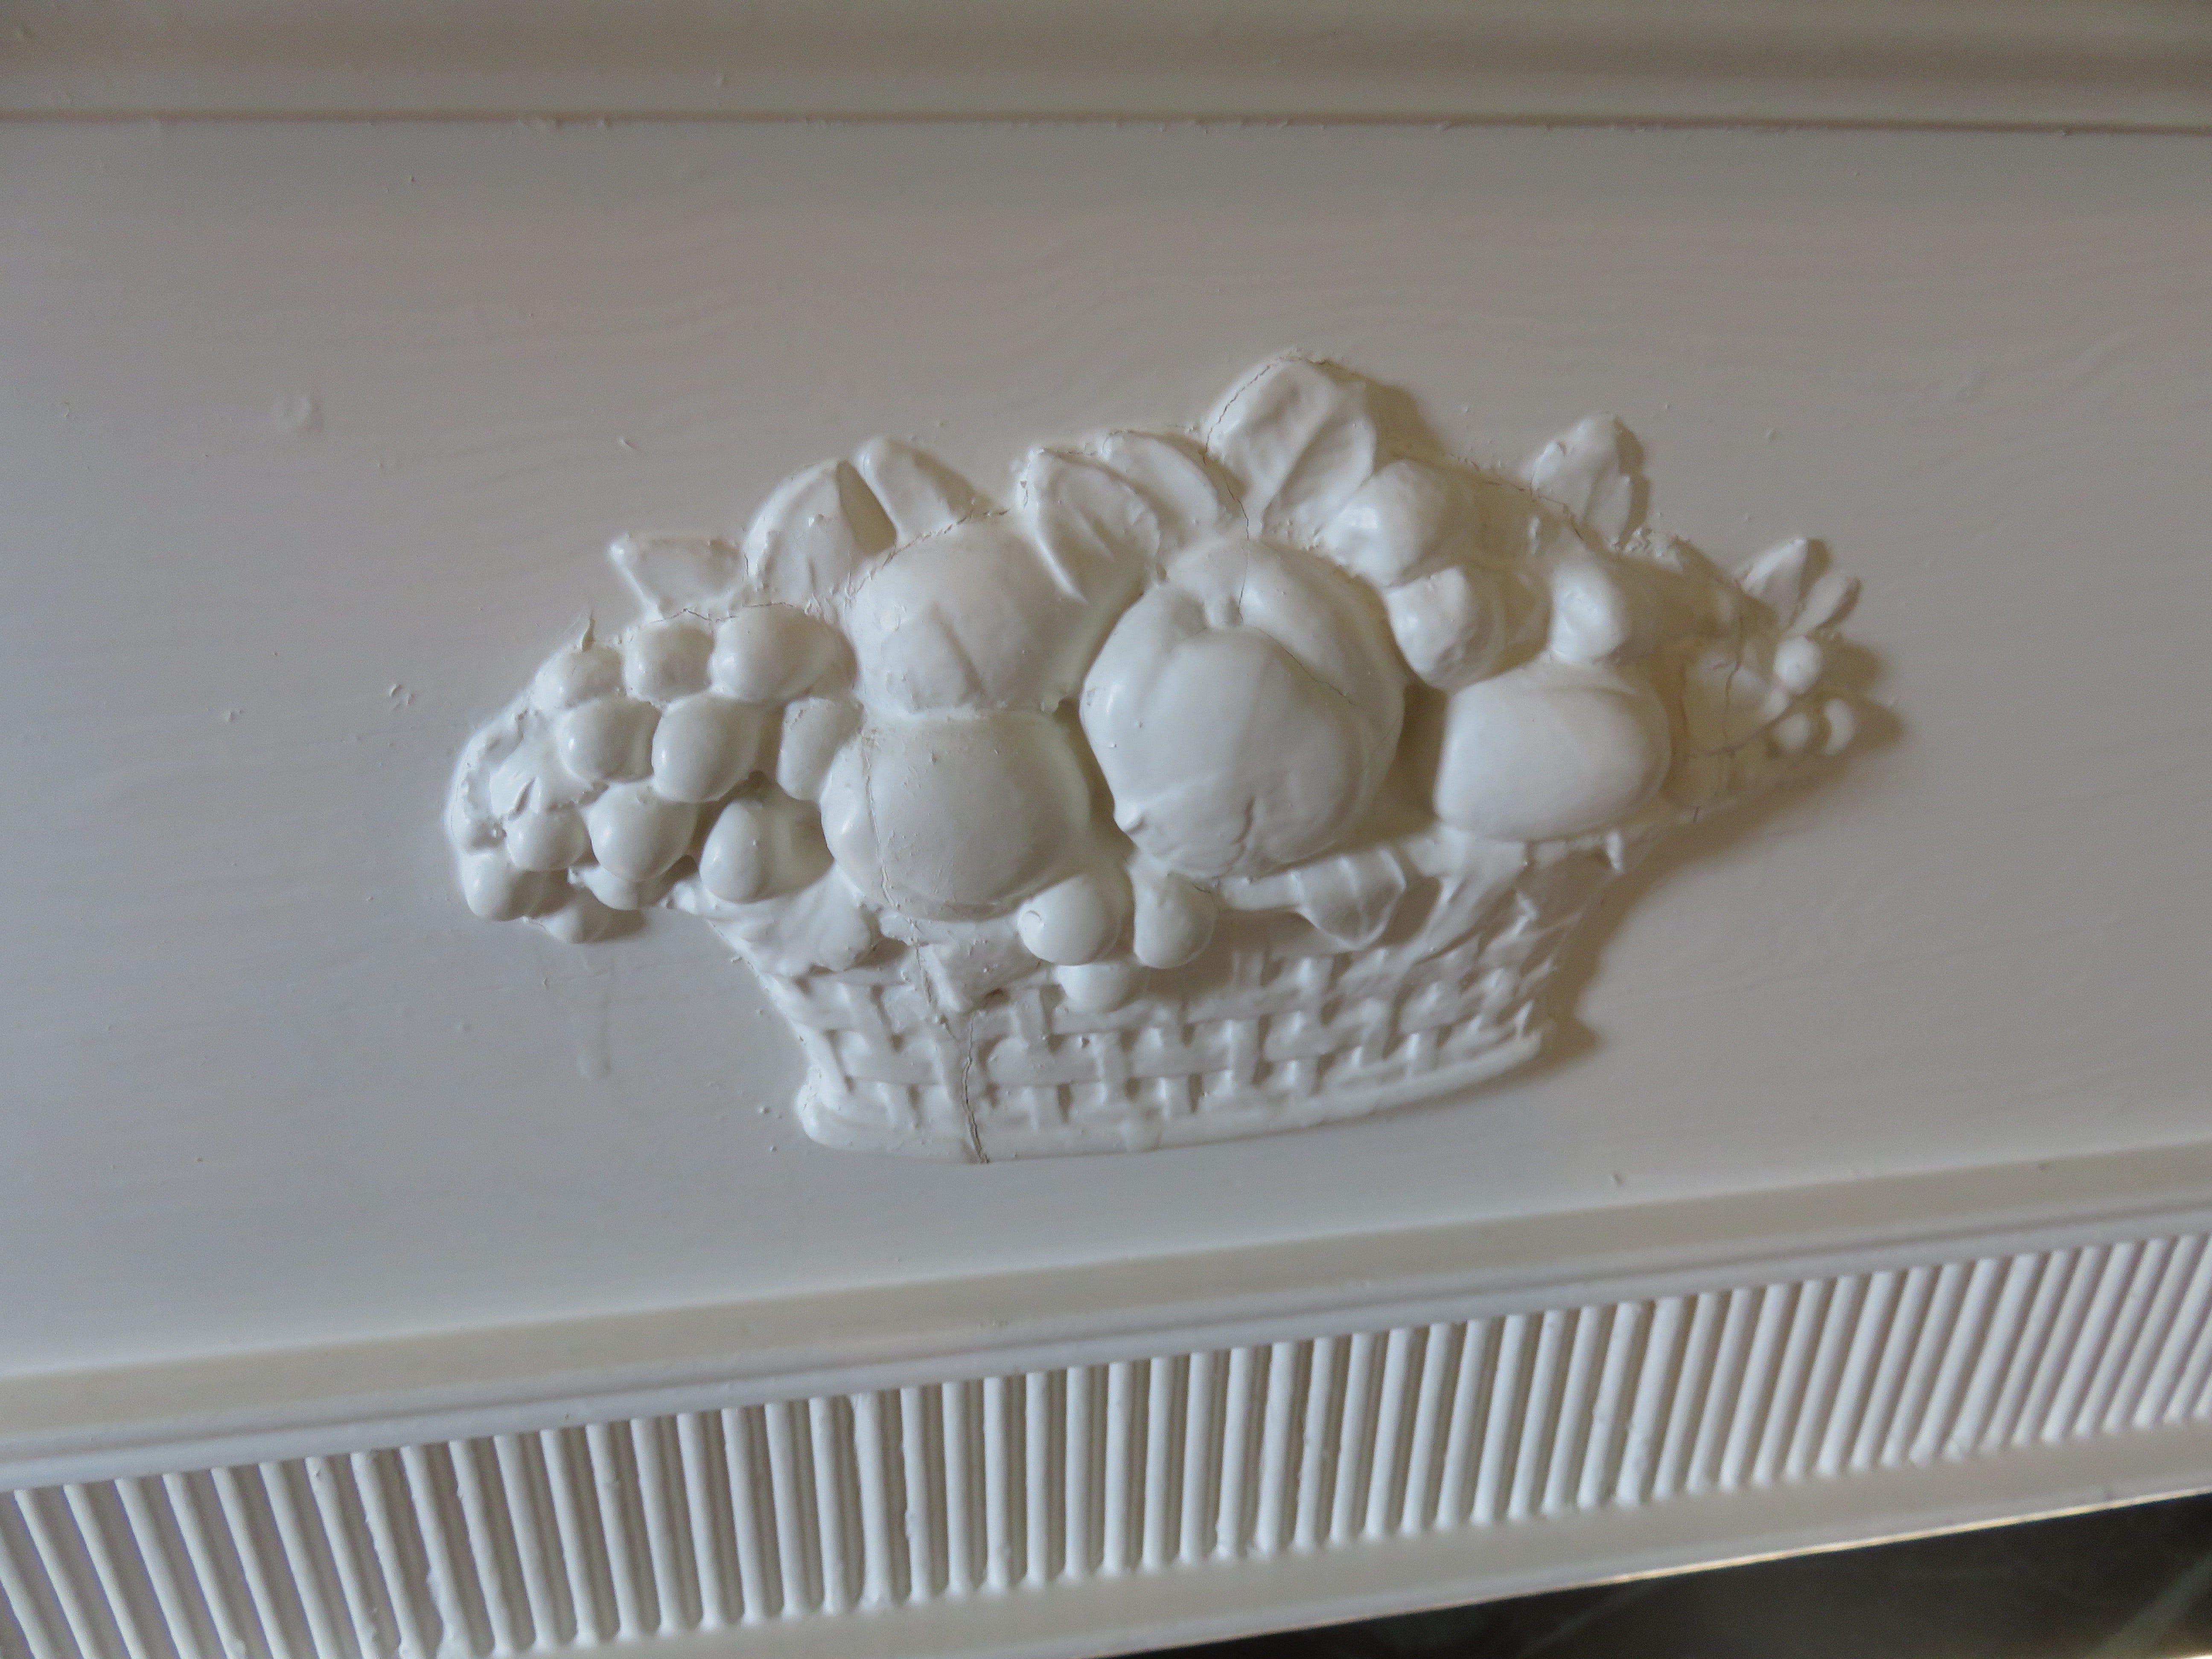 Harvest bowl depicted in detail on historic mantel.